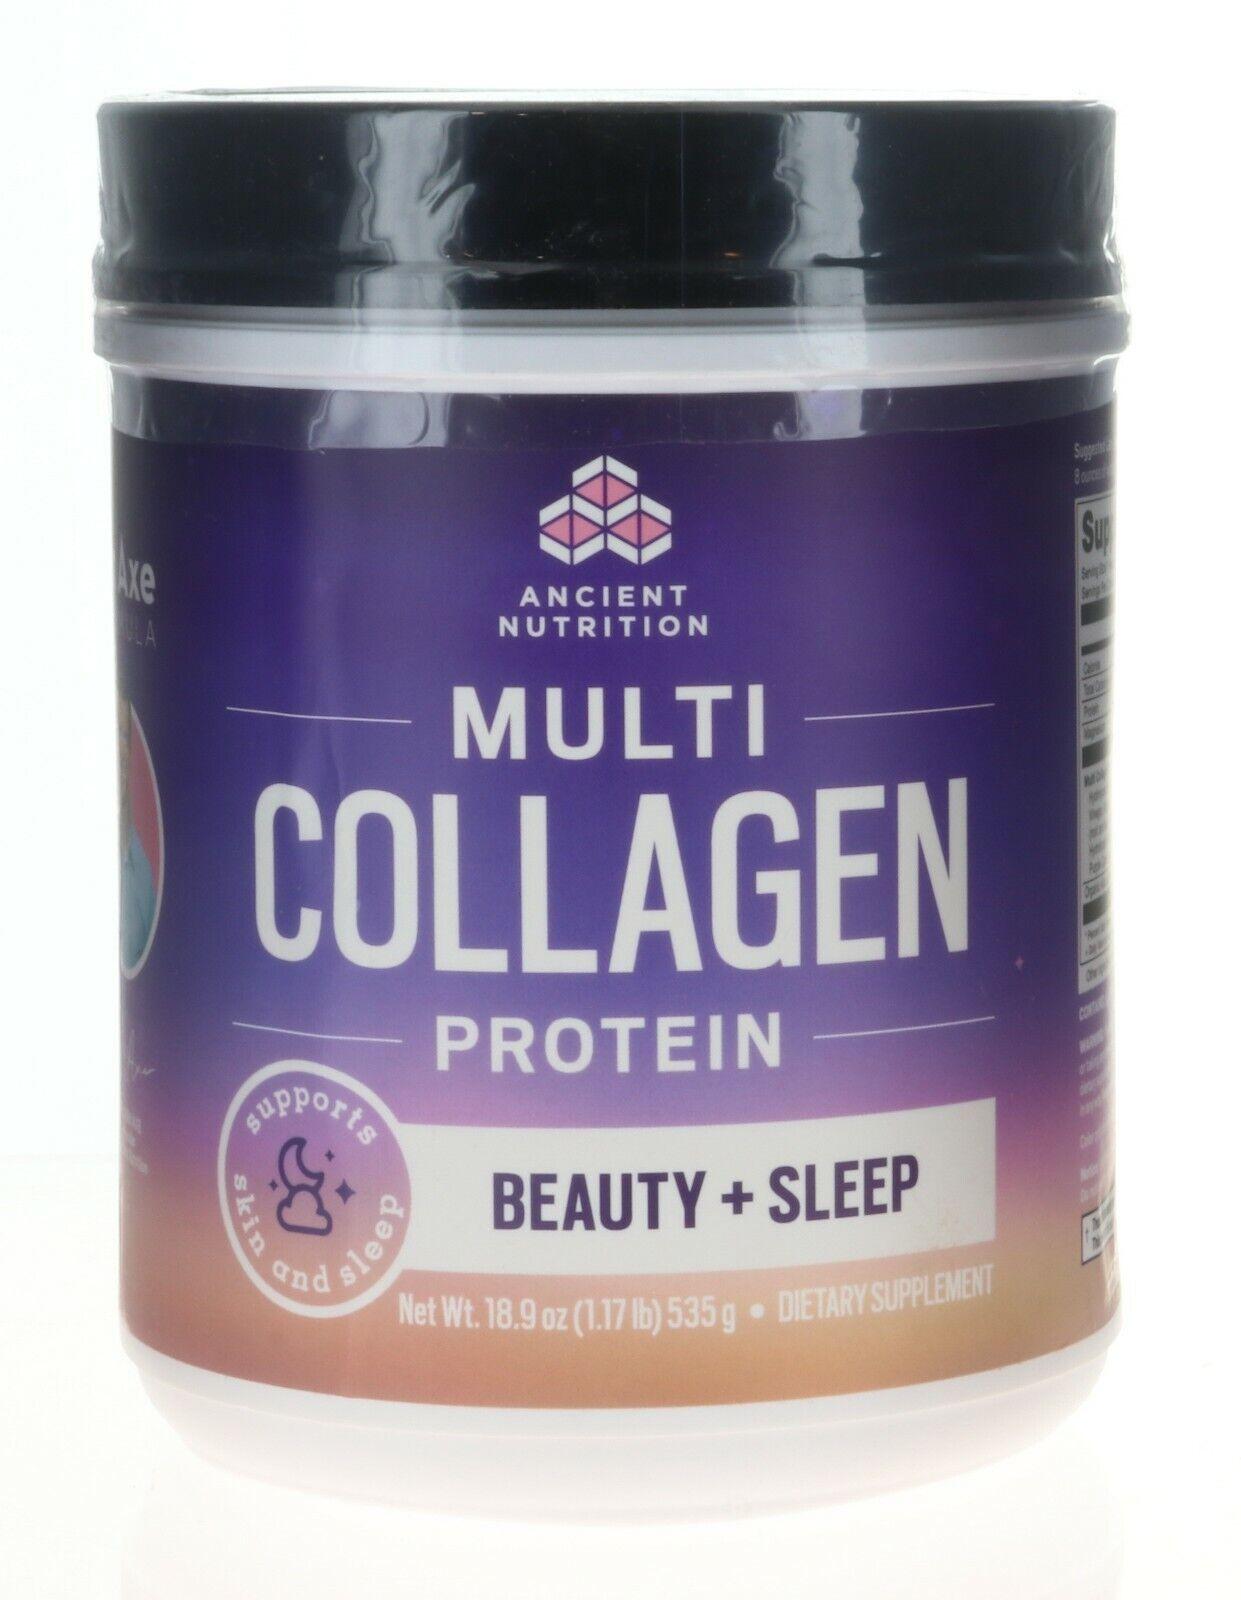 Ancient Nutrition Multi Collagen Protein Powder 38 Servings